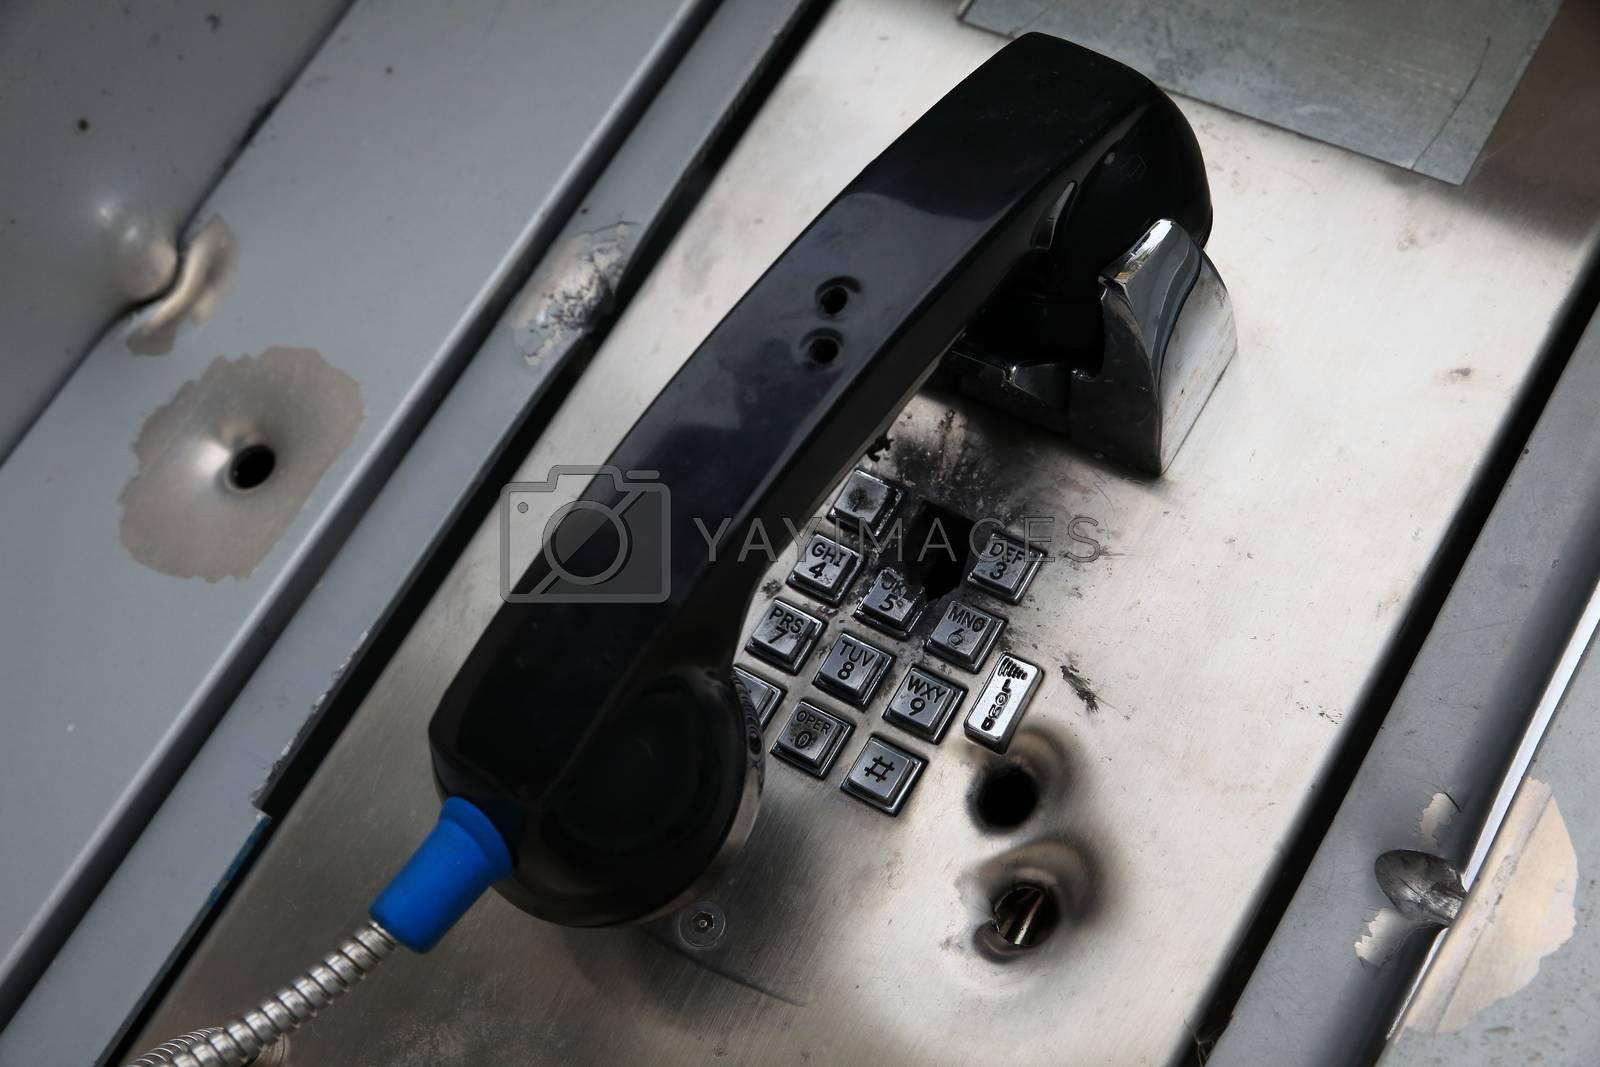 shot phone box with bullet holes Alaska USA